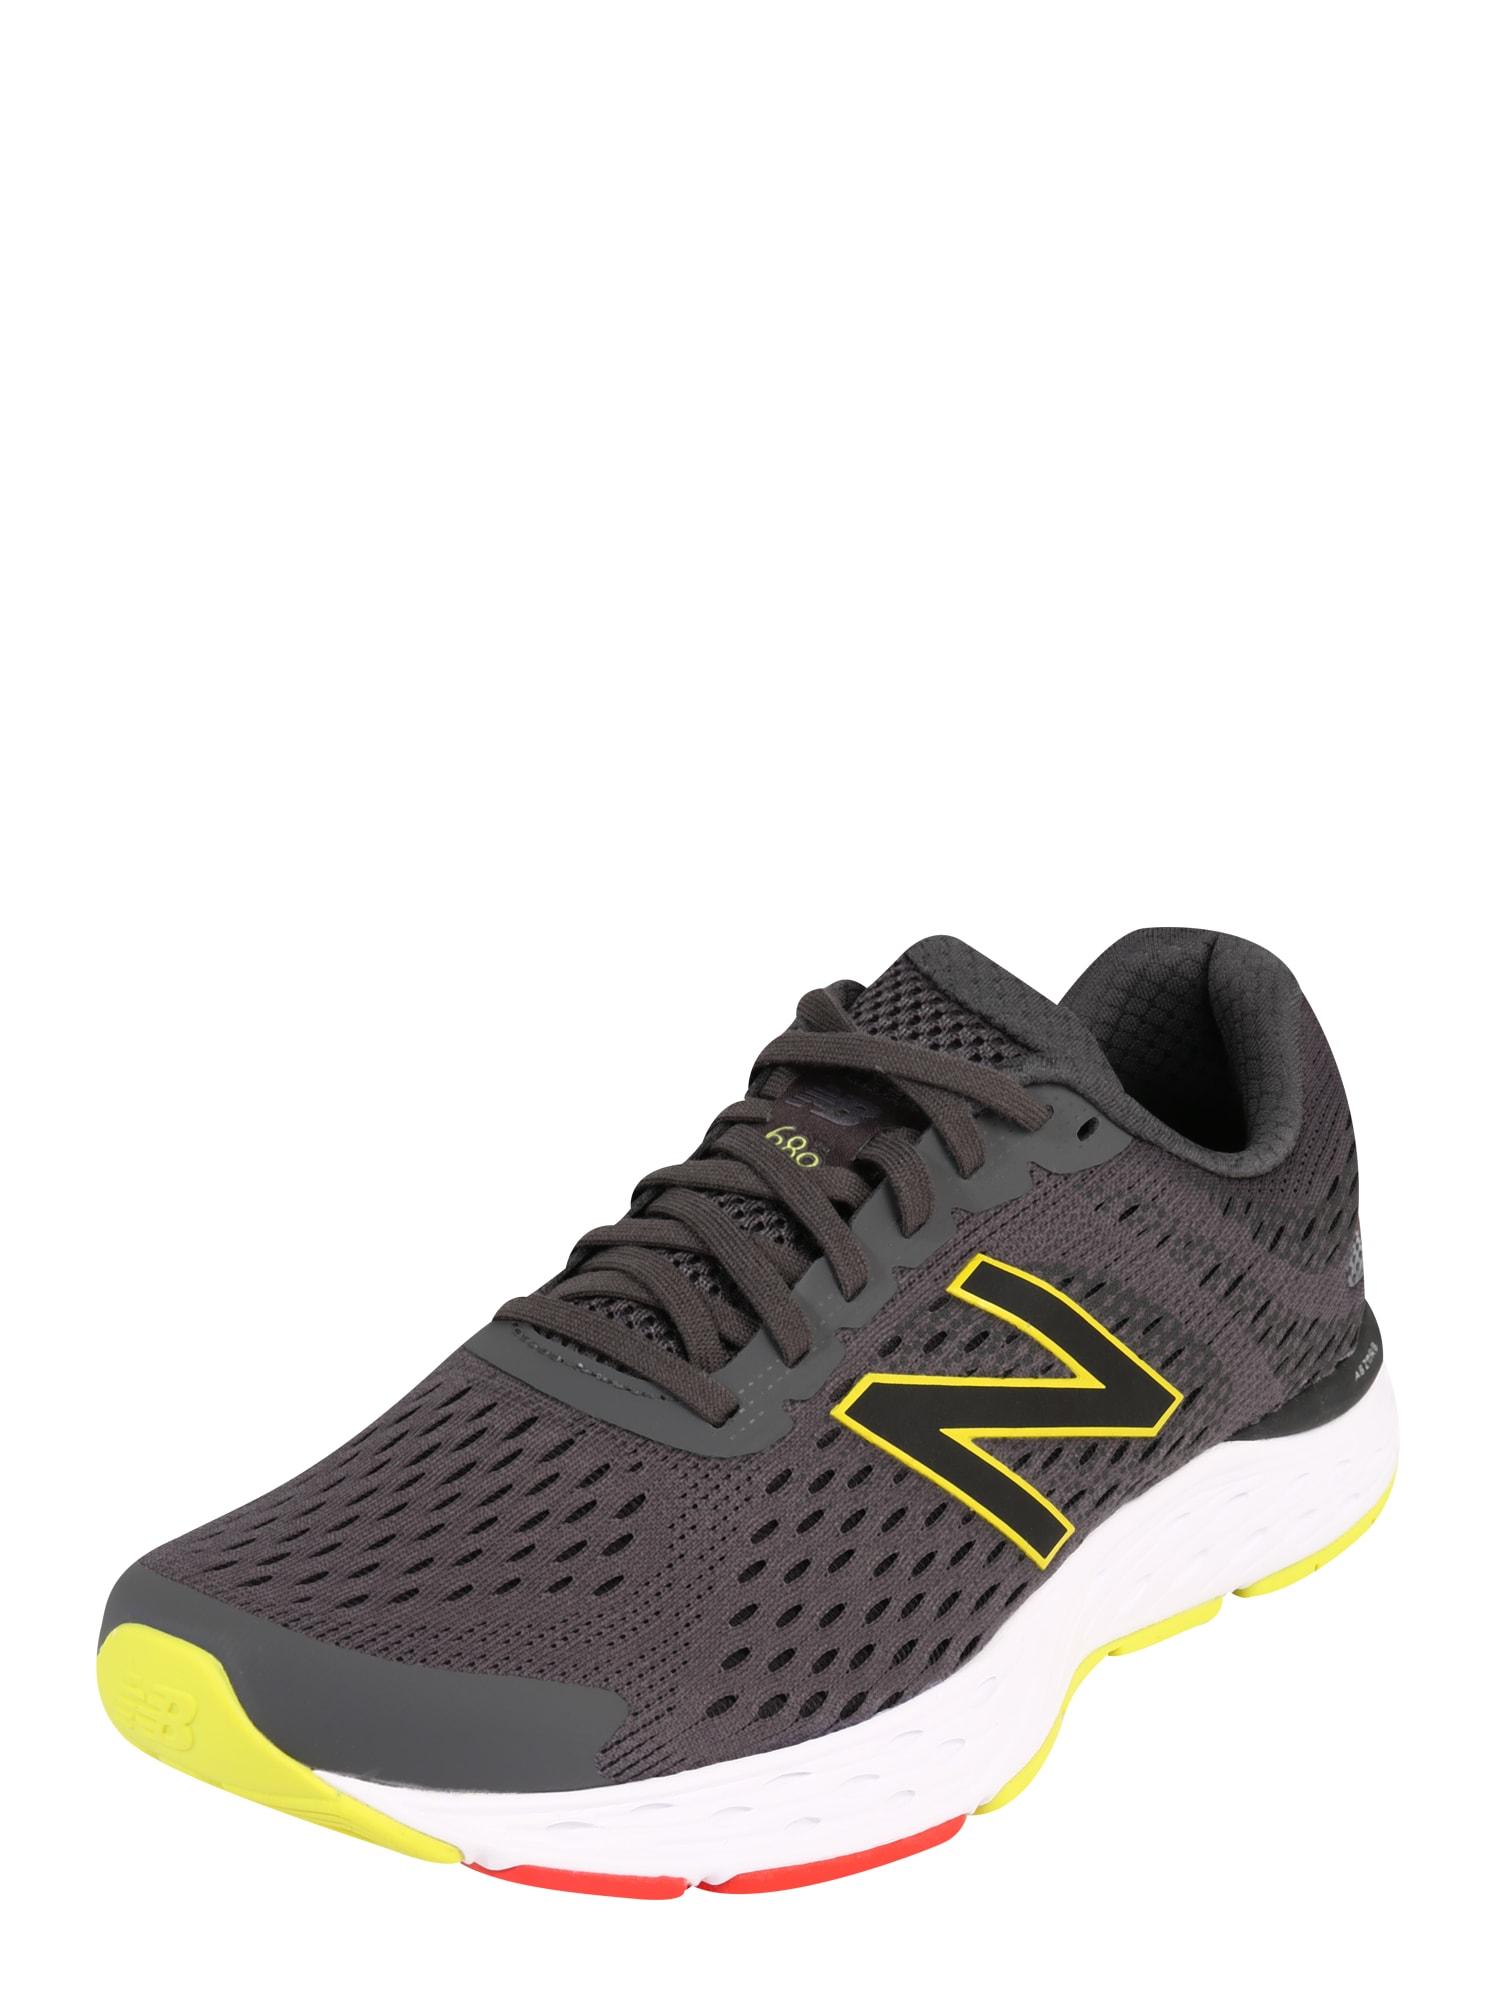 new balance Bėgimo batai '680 V6' geltona / antracito